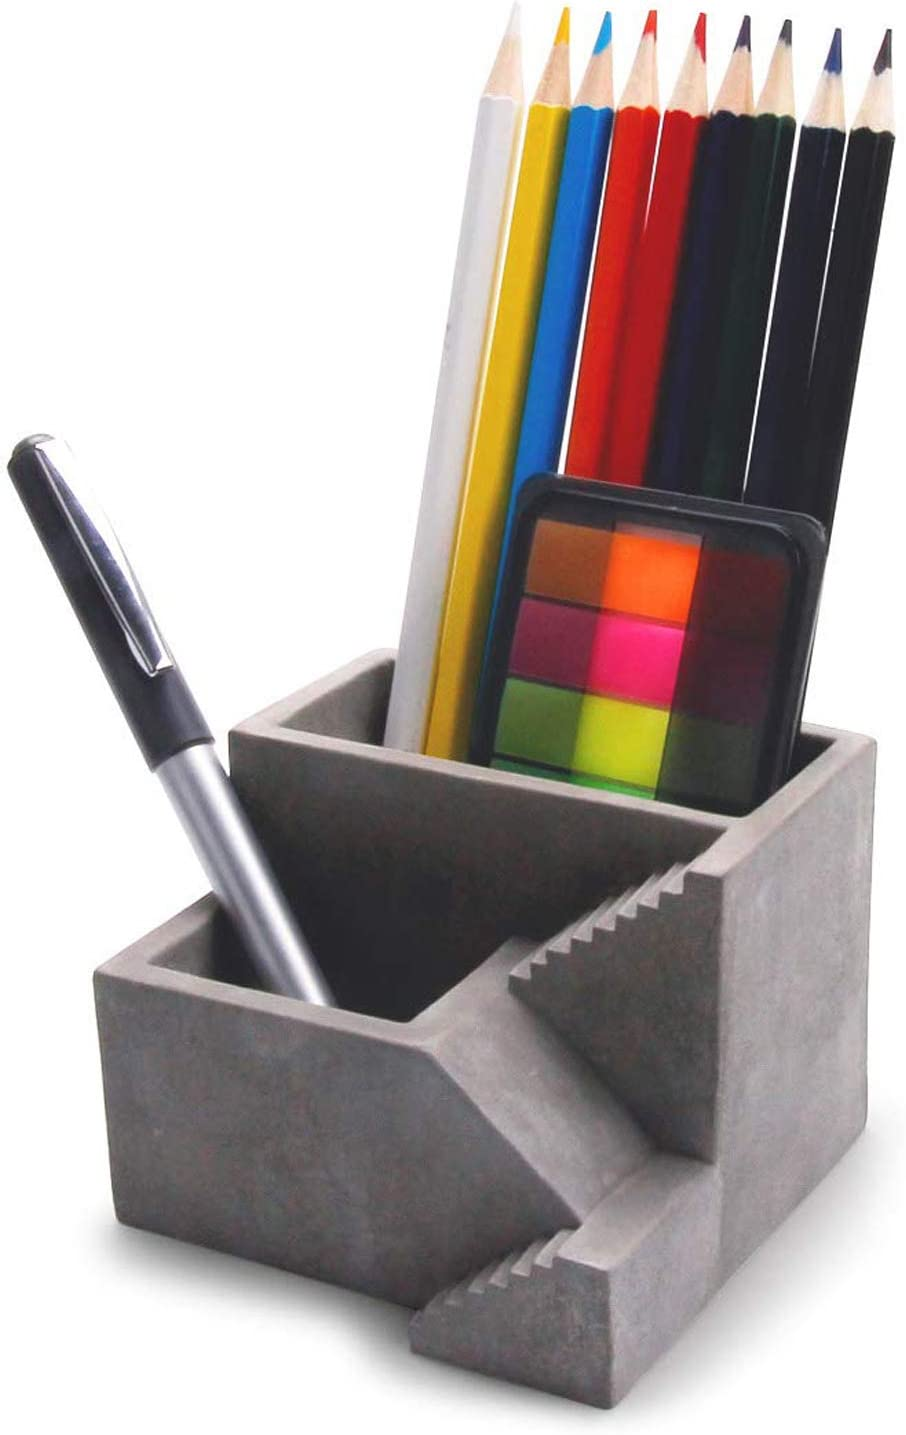 Grey Ideal Office Desktop Organizer with 2 Compartments ComSaf Concrete Desktop Planter//Cement Pen Pencil Holder with Small Succulent Planter Box Set of 1